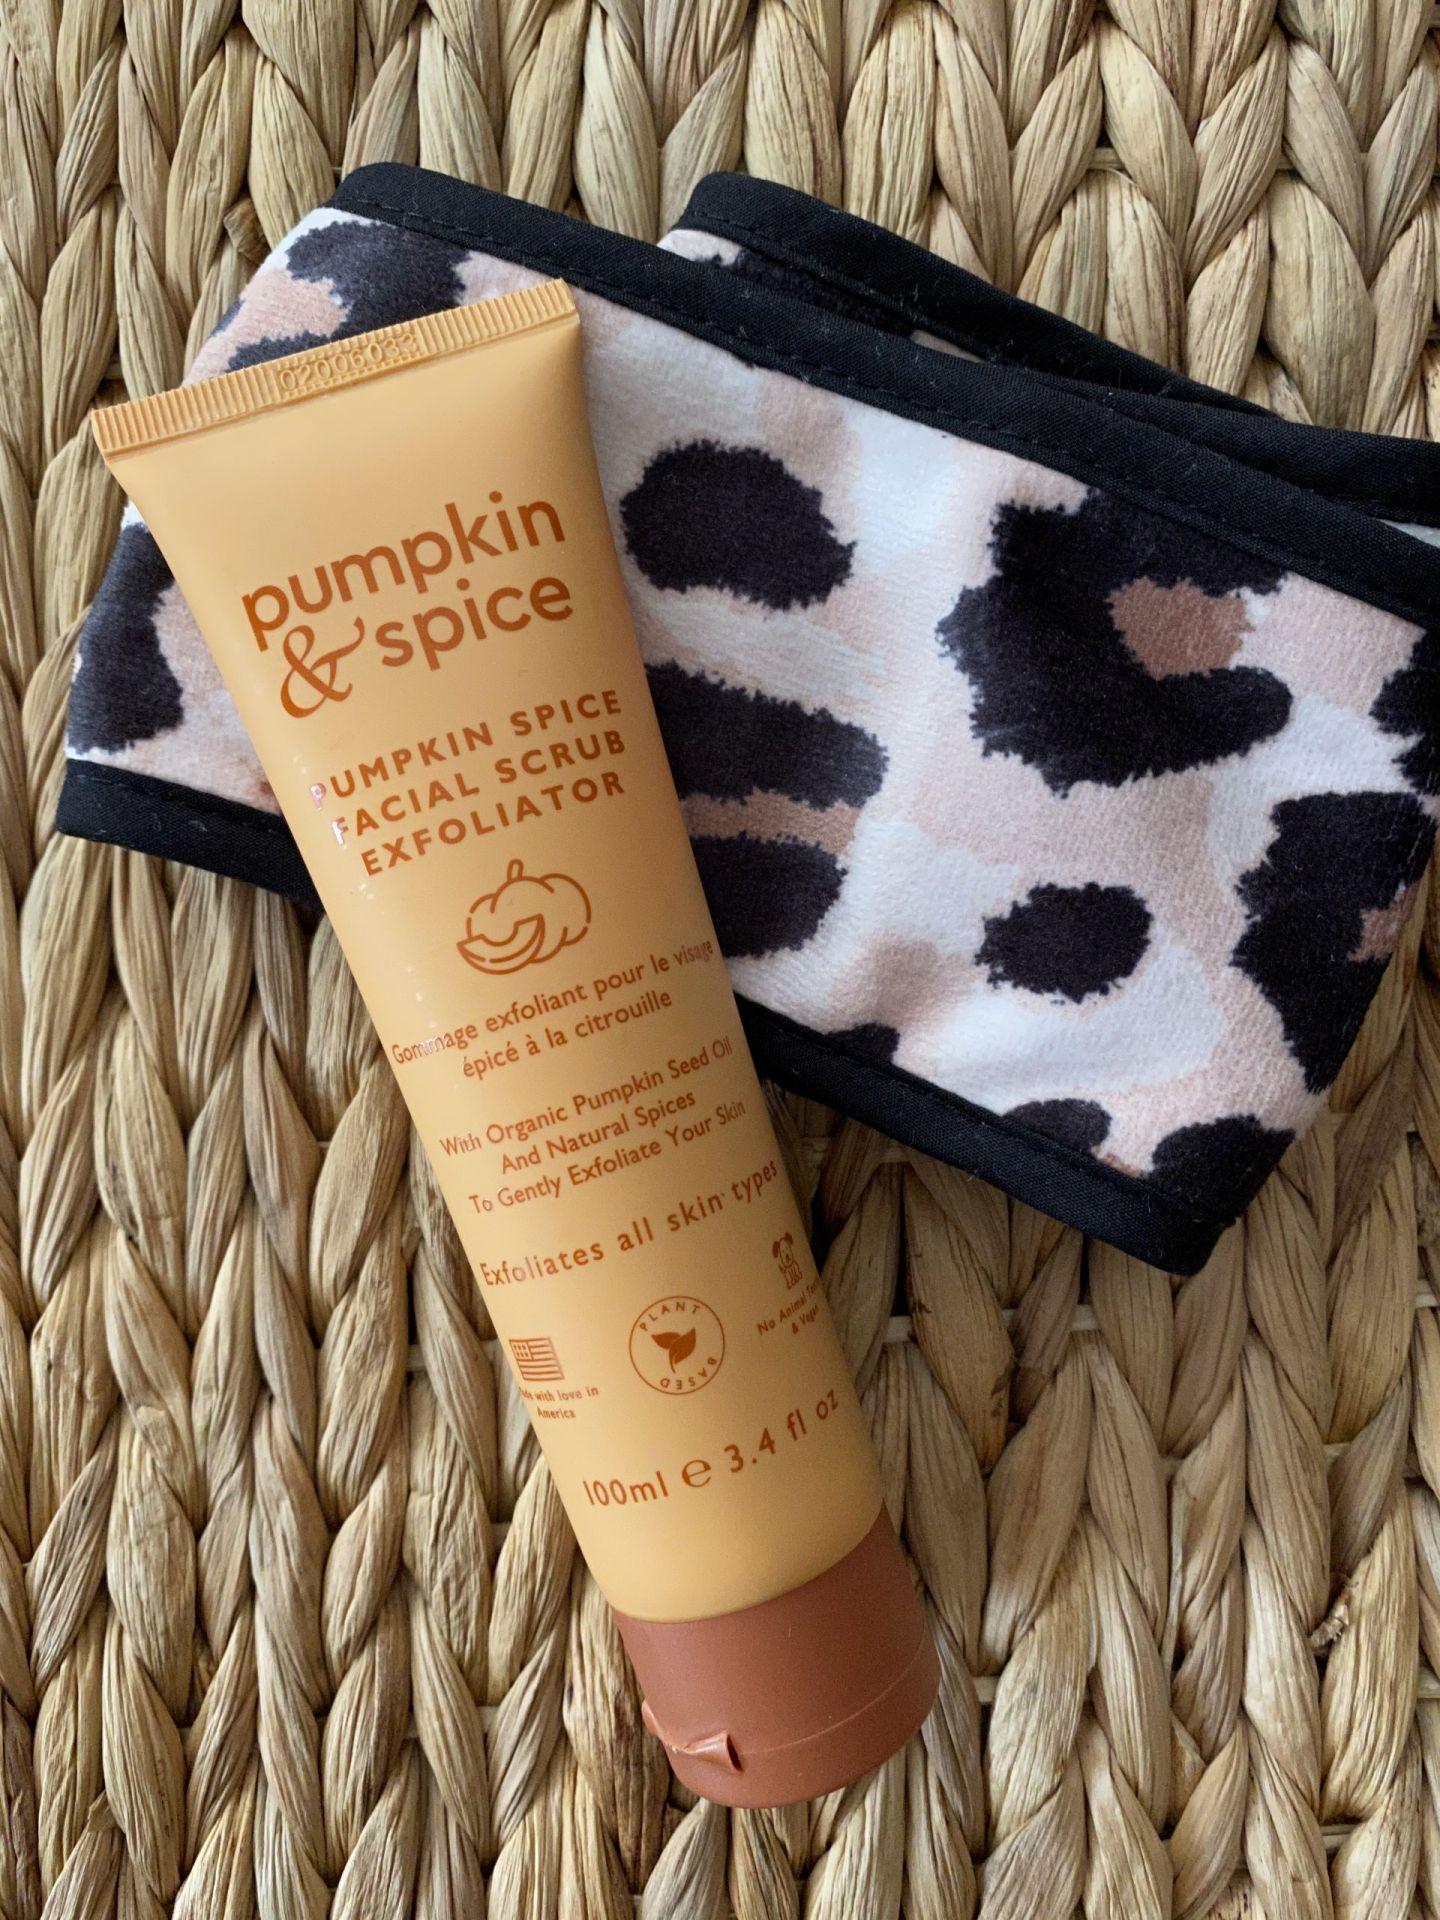 Pumpkin & Spice Exfoliator/Kitsch headband